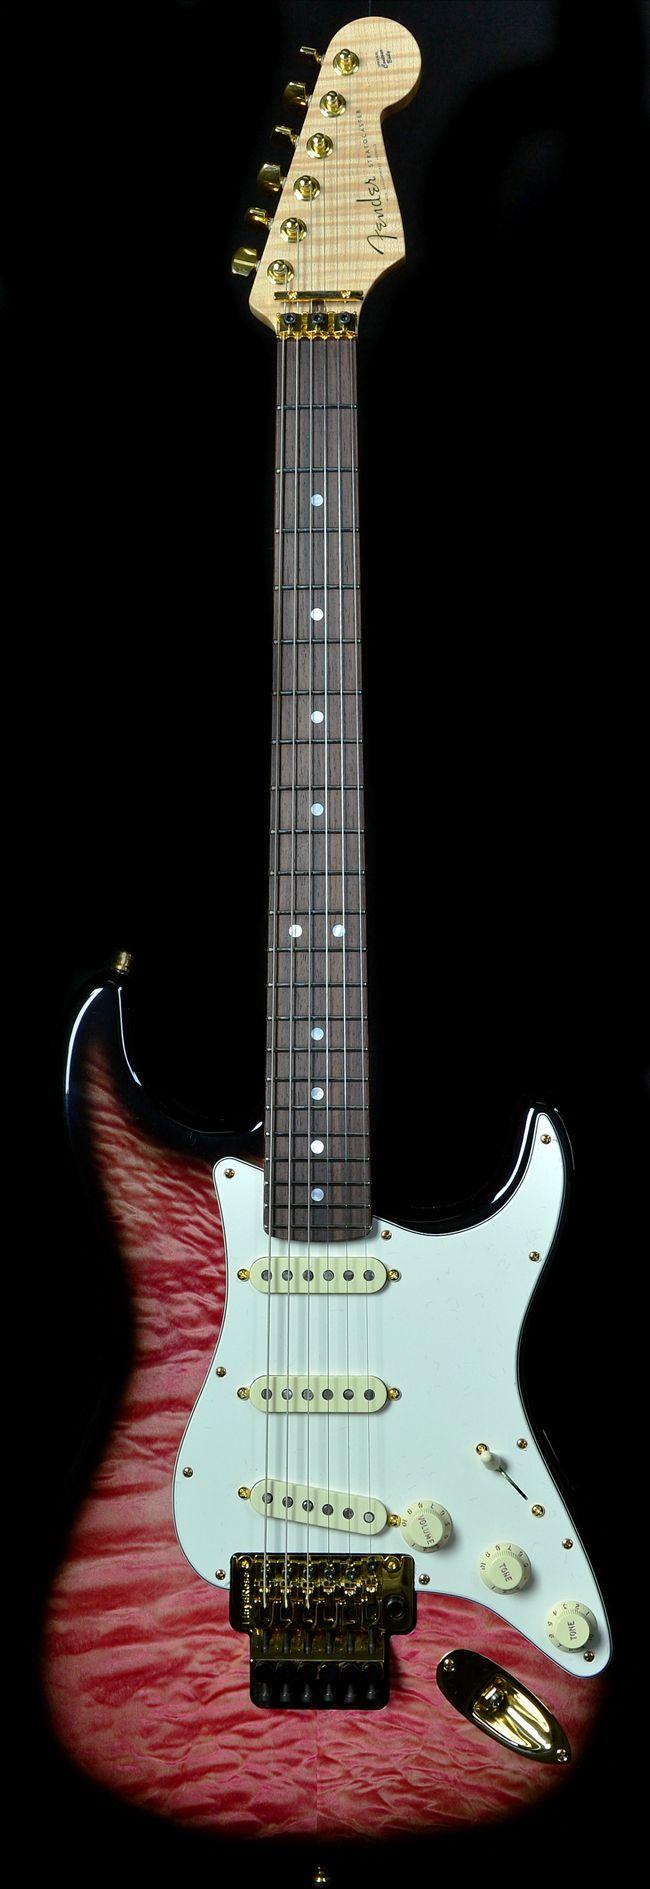 97 best guitars and music images on pinterest musical instruments rh pinterest com